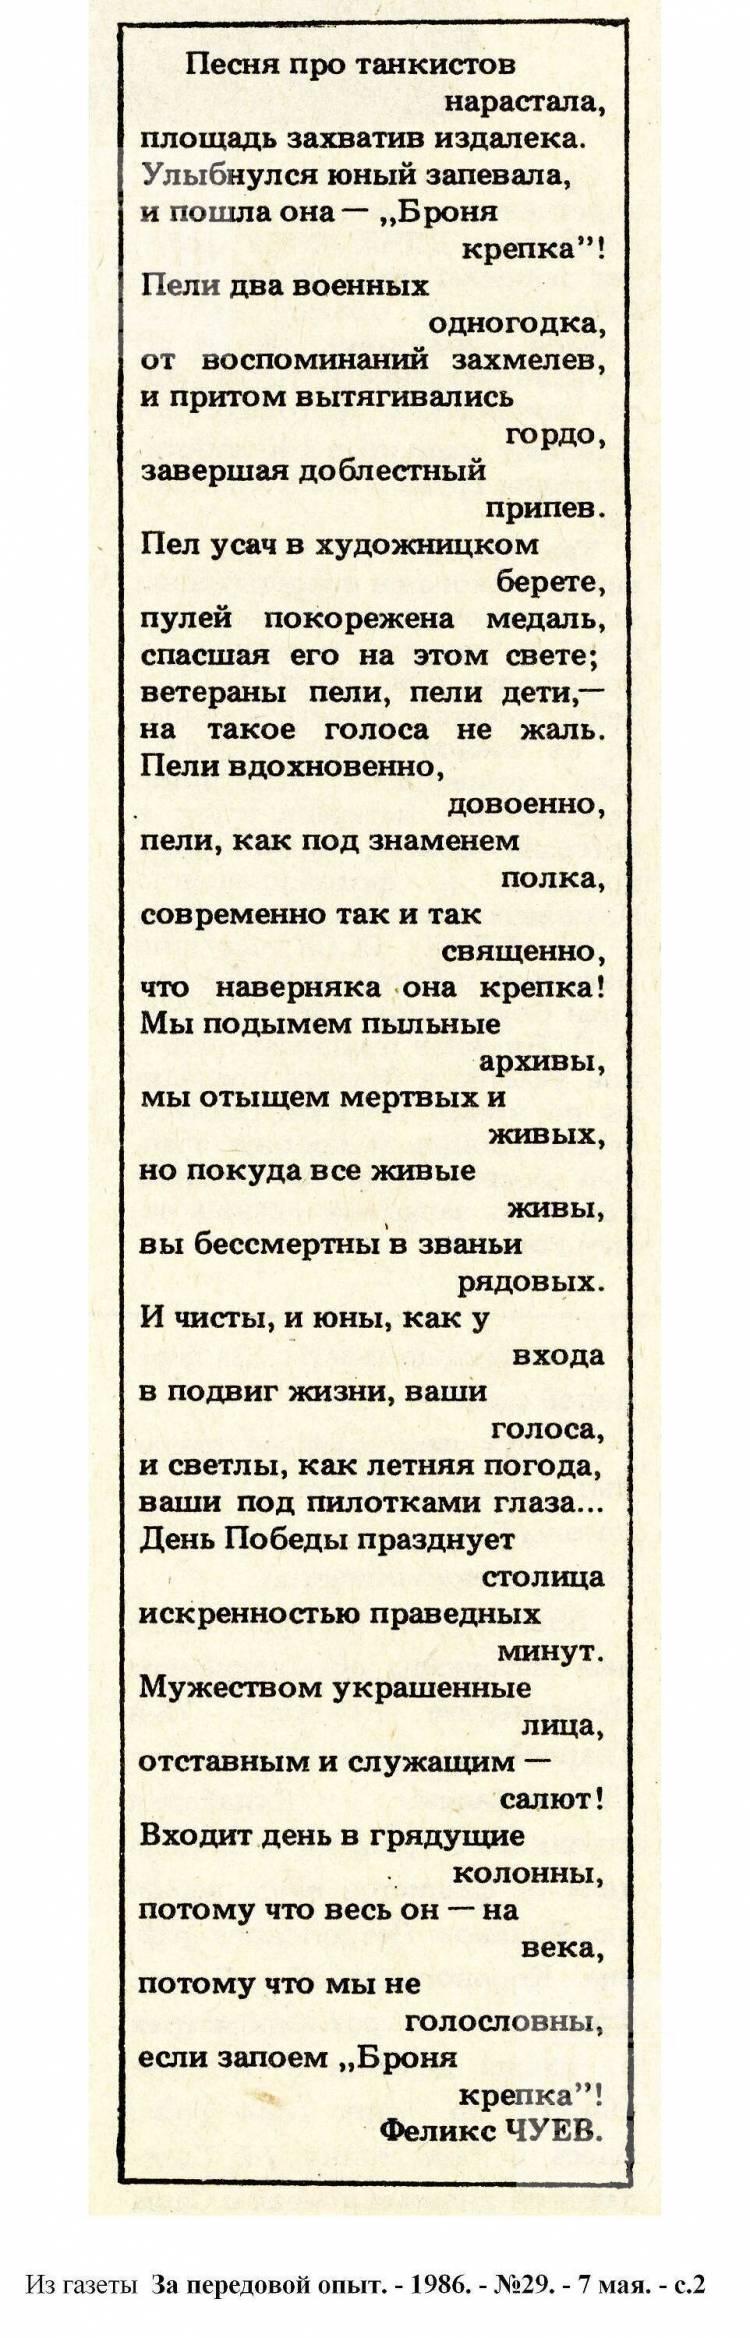 """Песня про танкистов нарастала..."". 1986, №29"